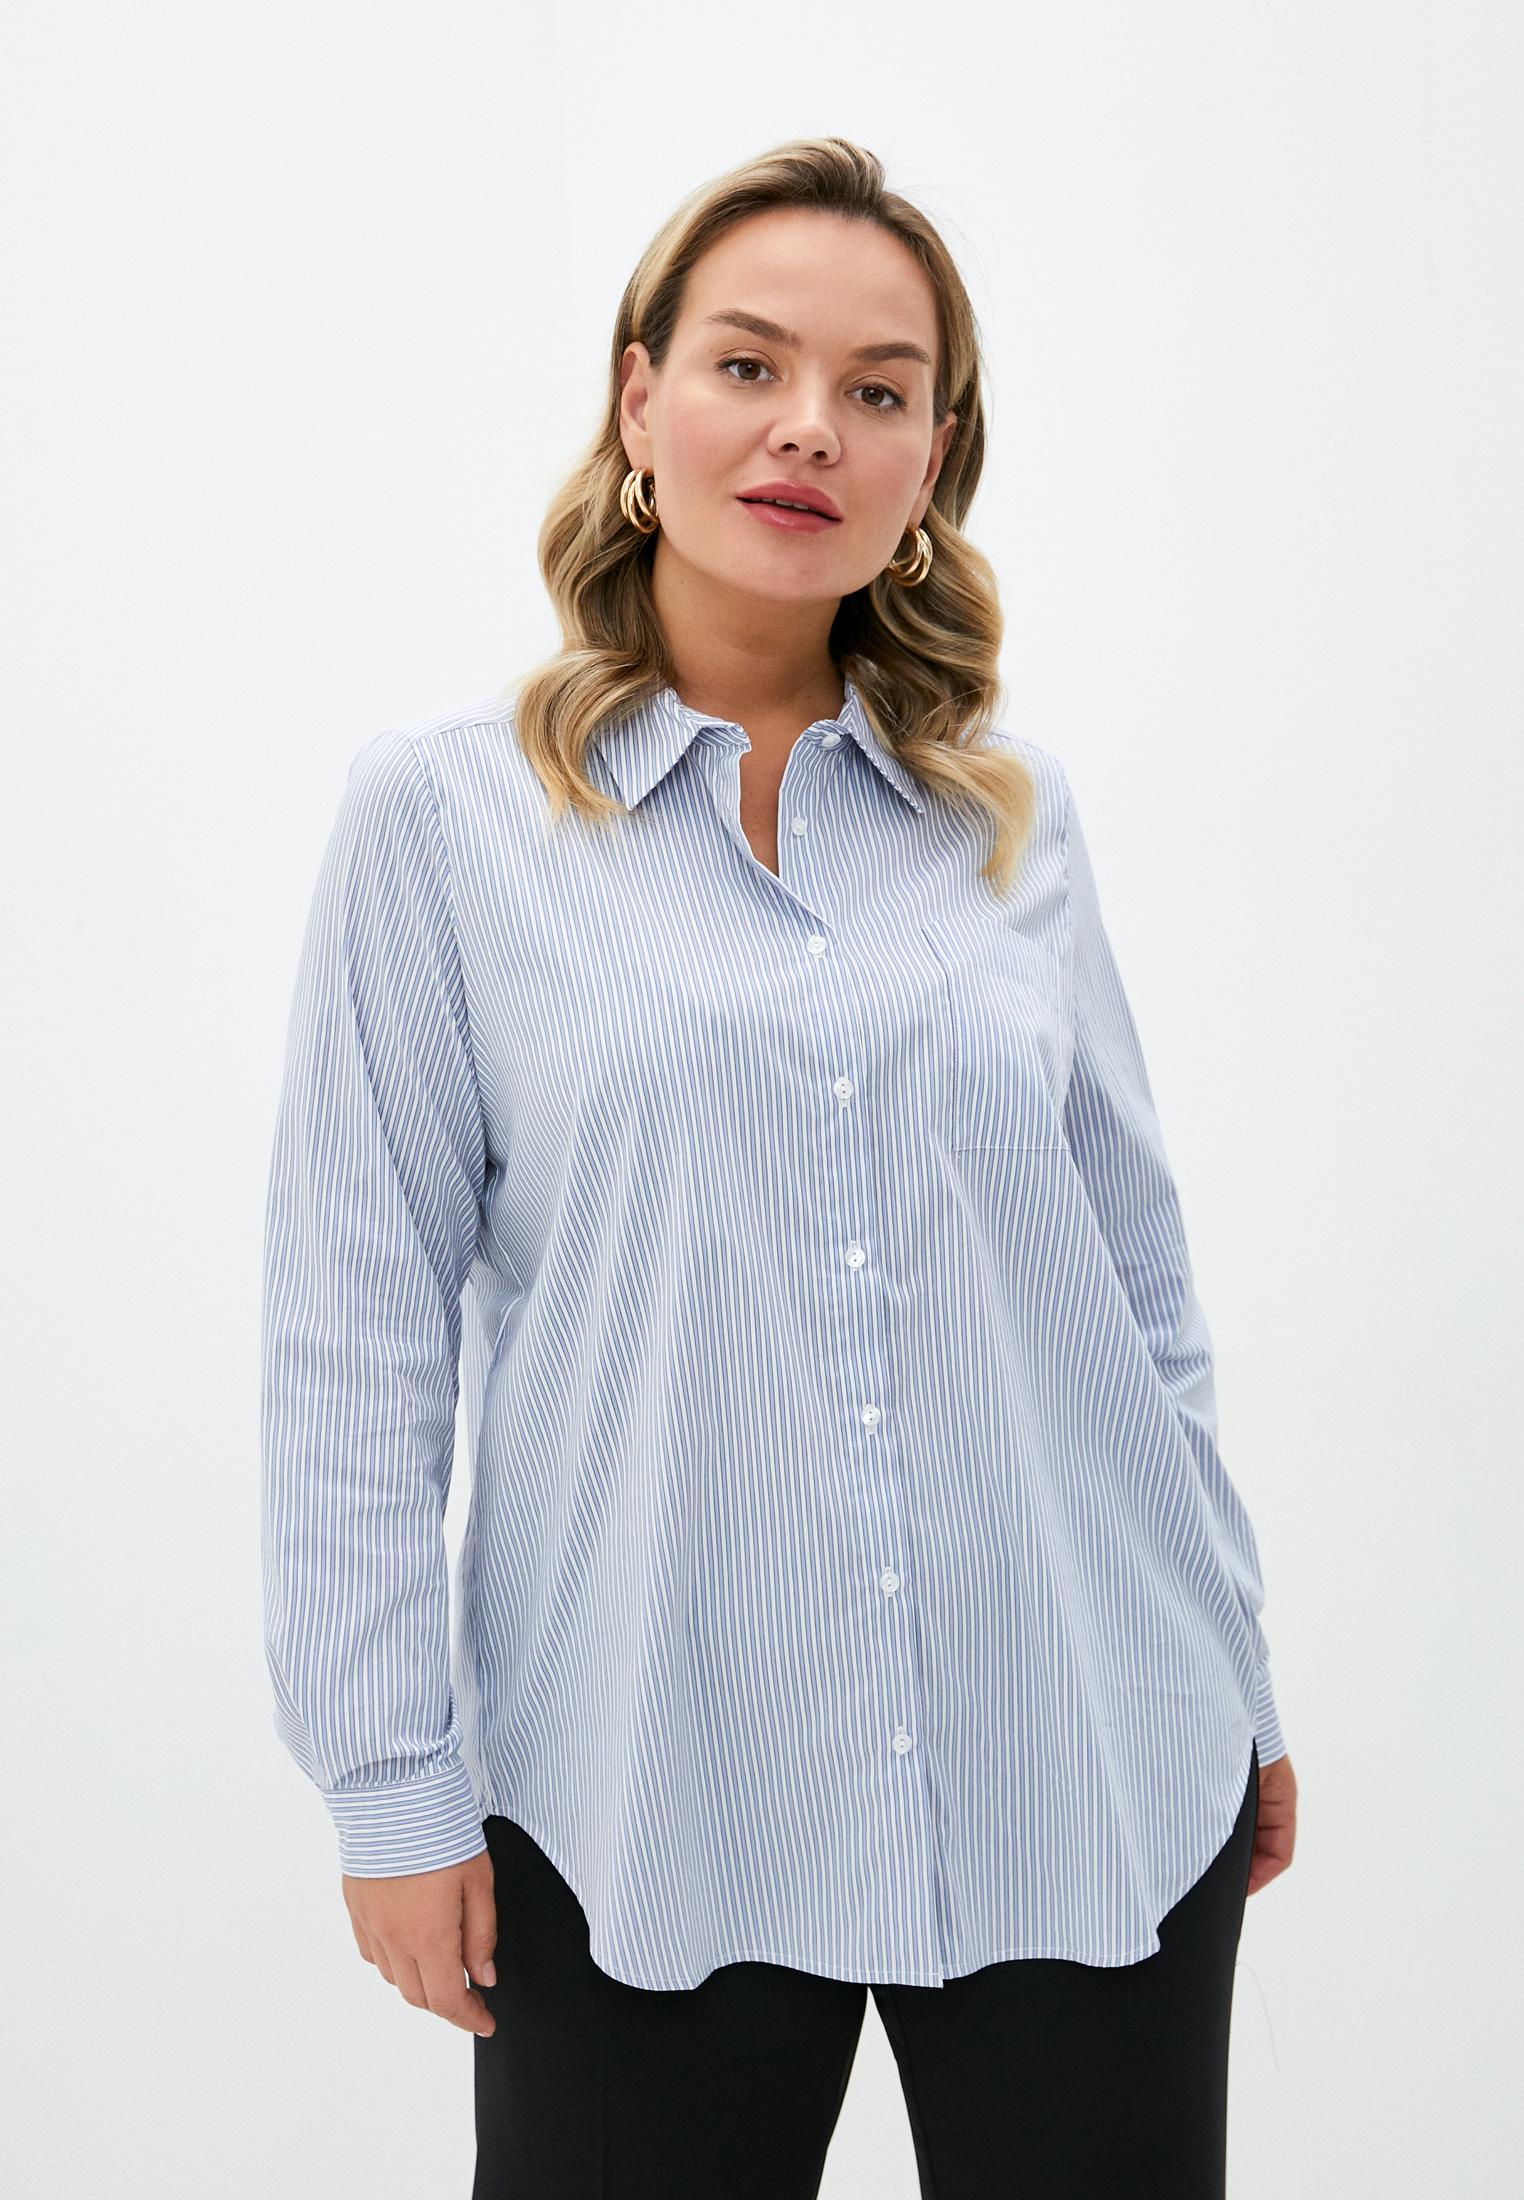 Женские рубашки с длинным рукавом Persona by Marina Rinaldi 1113580